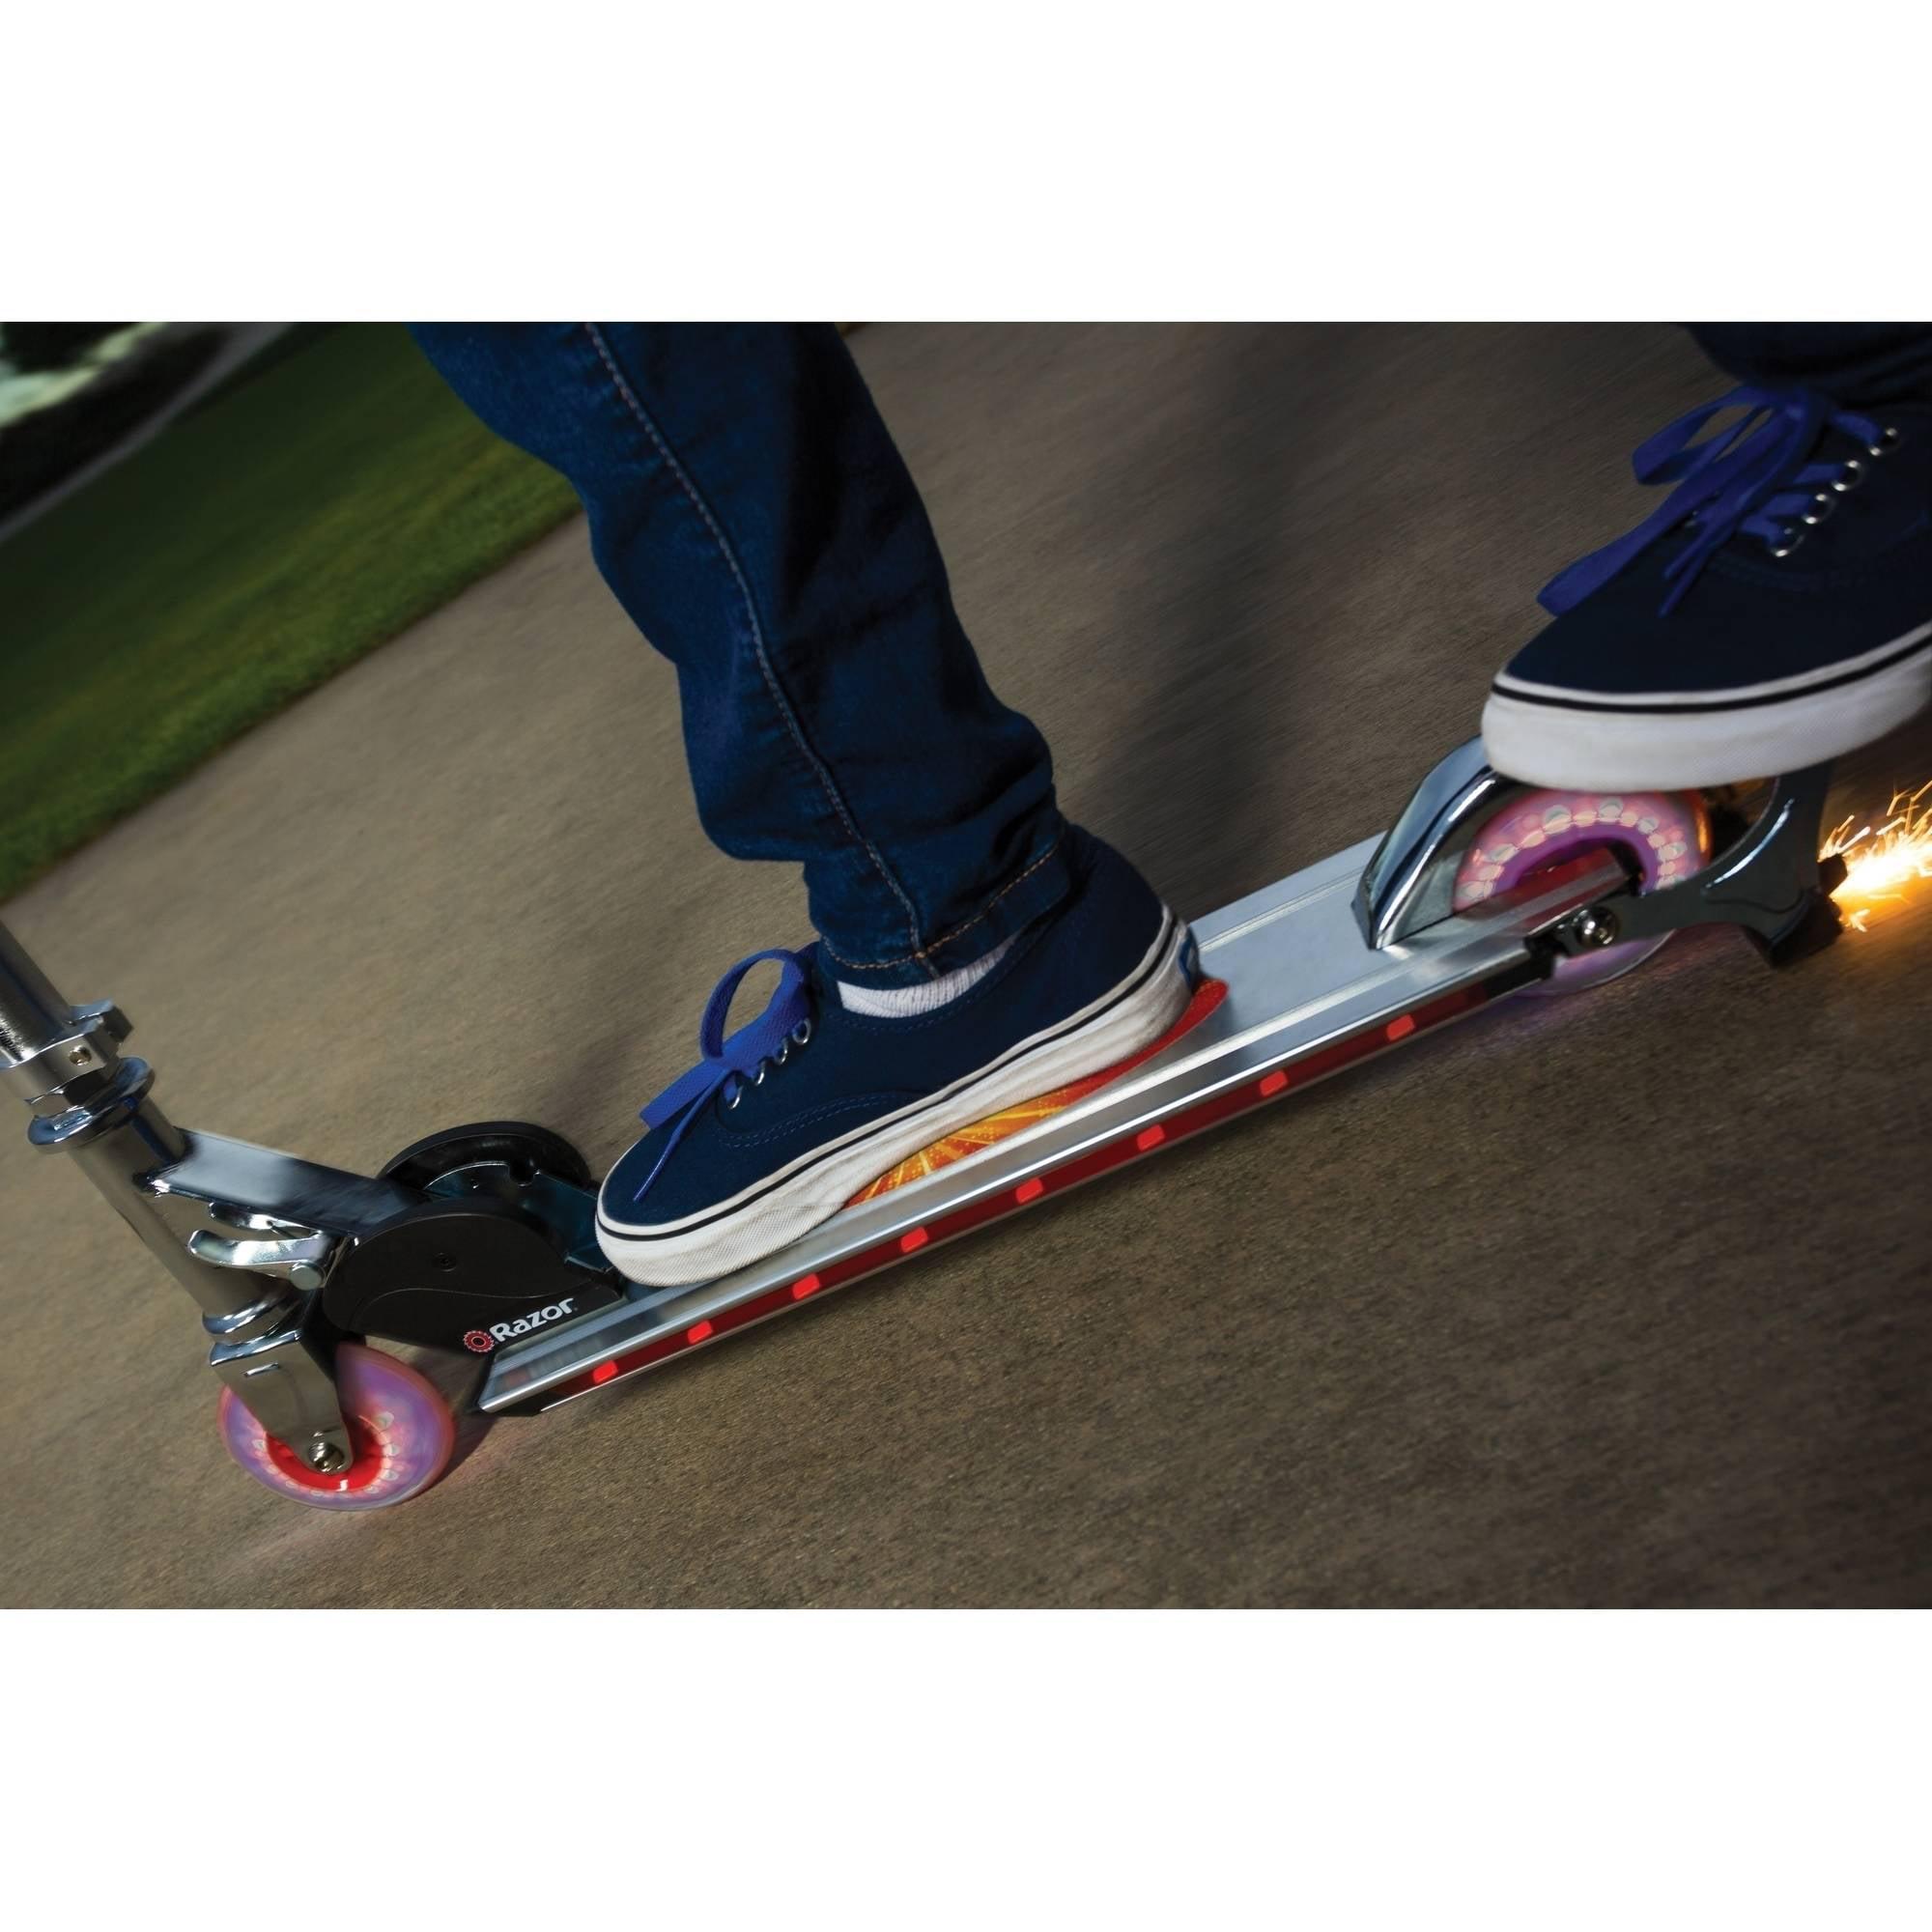 Razor Kids Scooter Kick Outdoor Sports Ride On Push Folding Wheels